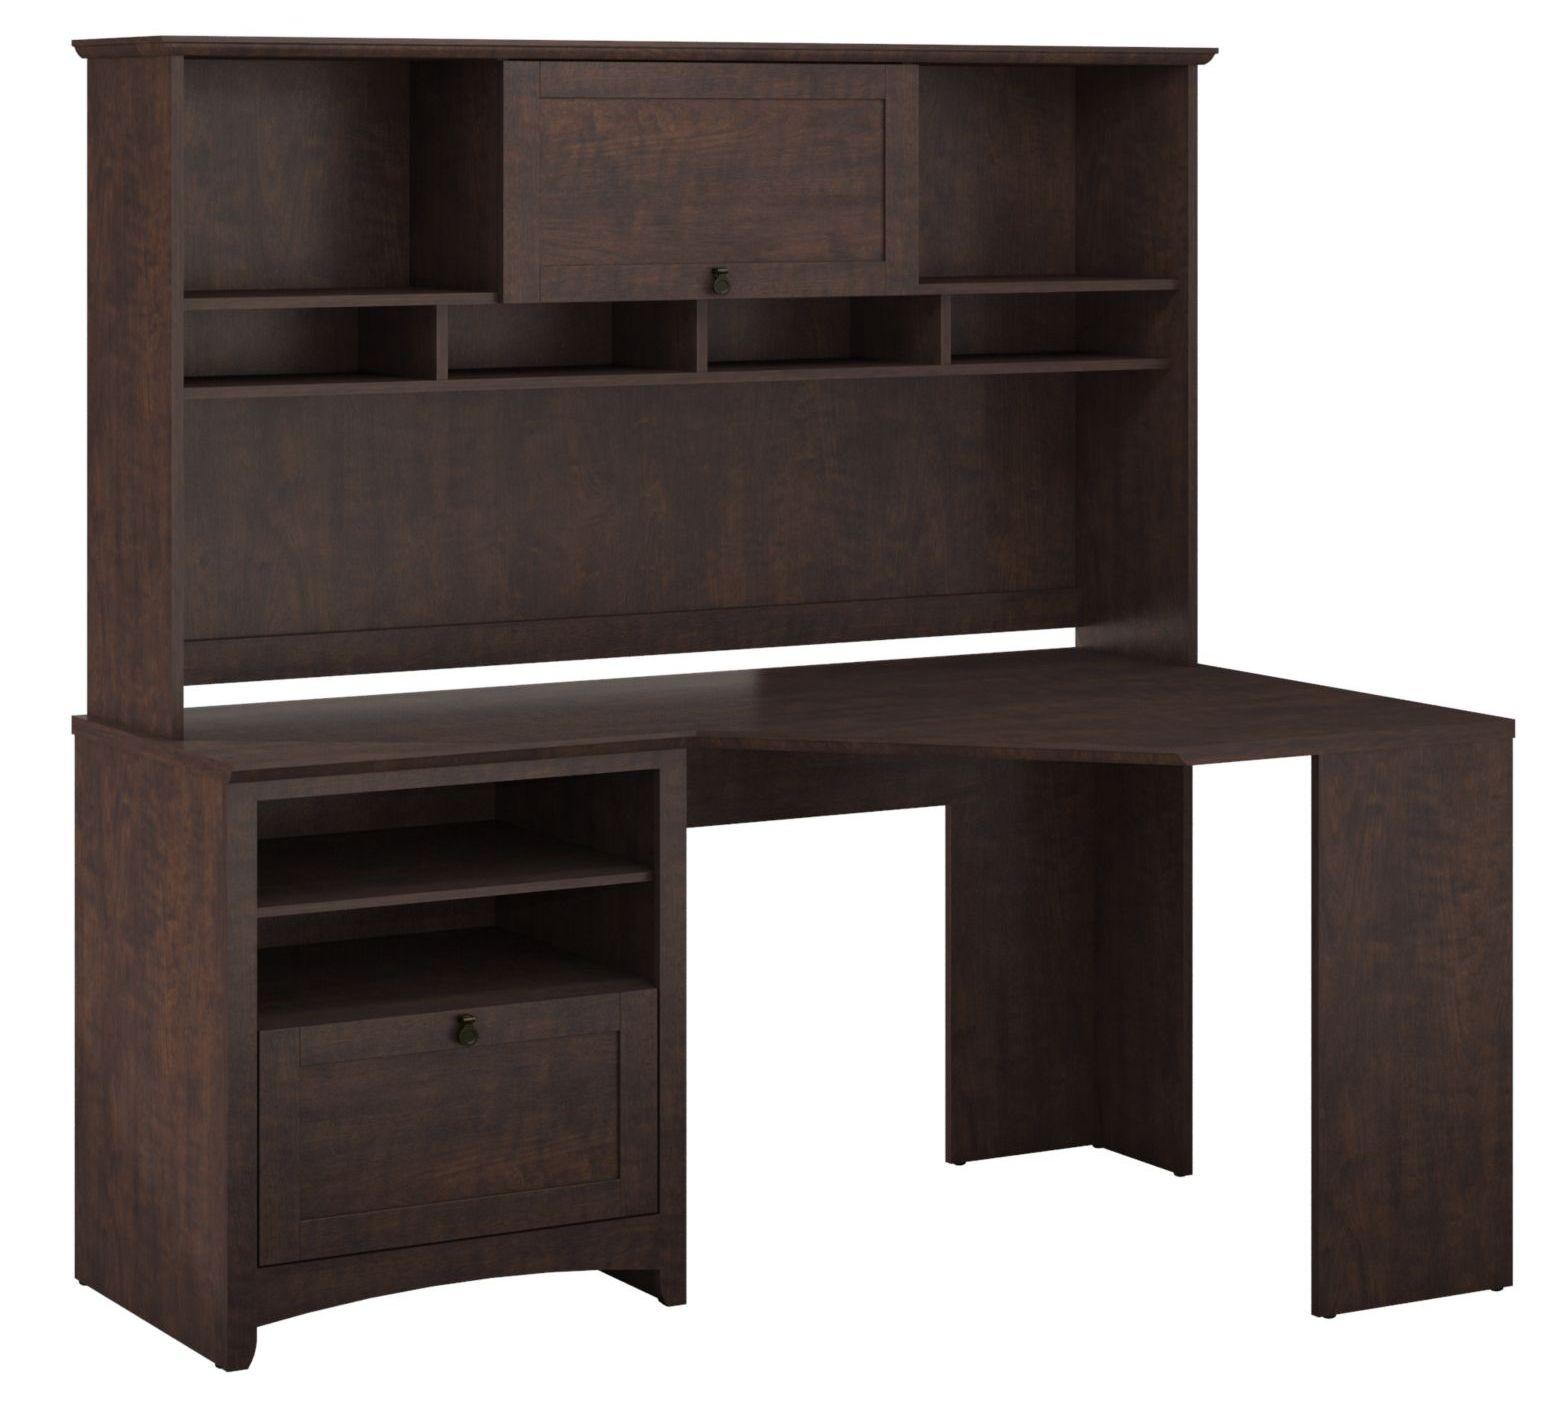 buena vista madison cherry corner desk with hutch from bush buv008msc coleman furniture. Black Bedroom Furniture Sets. Home Design Ideas